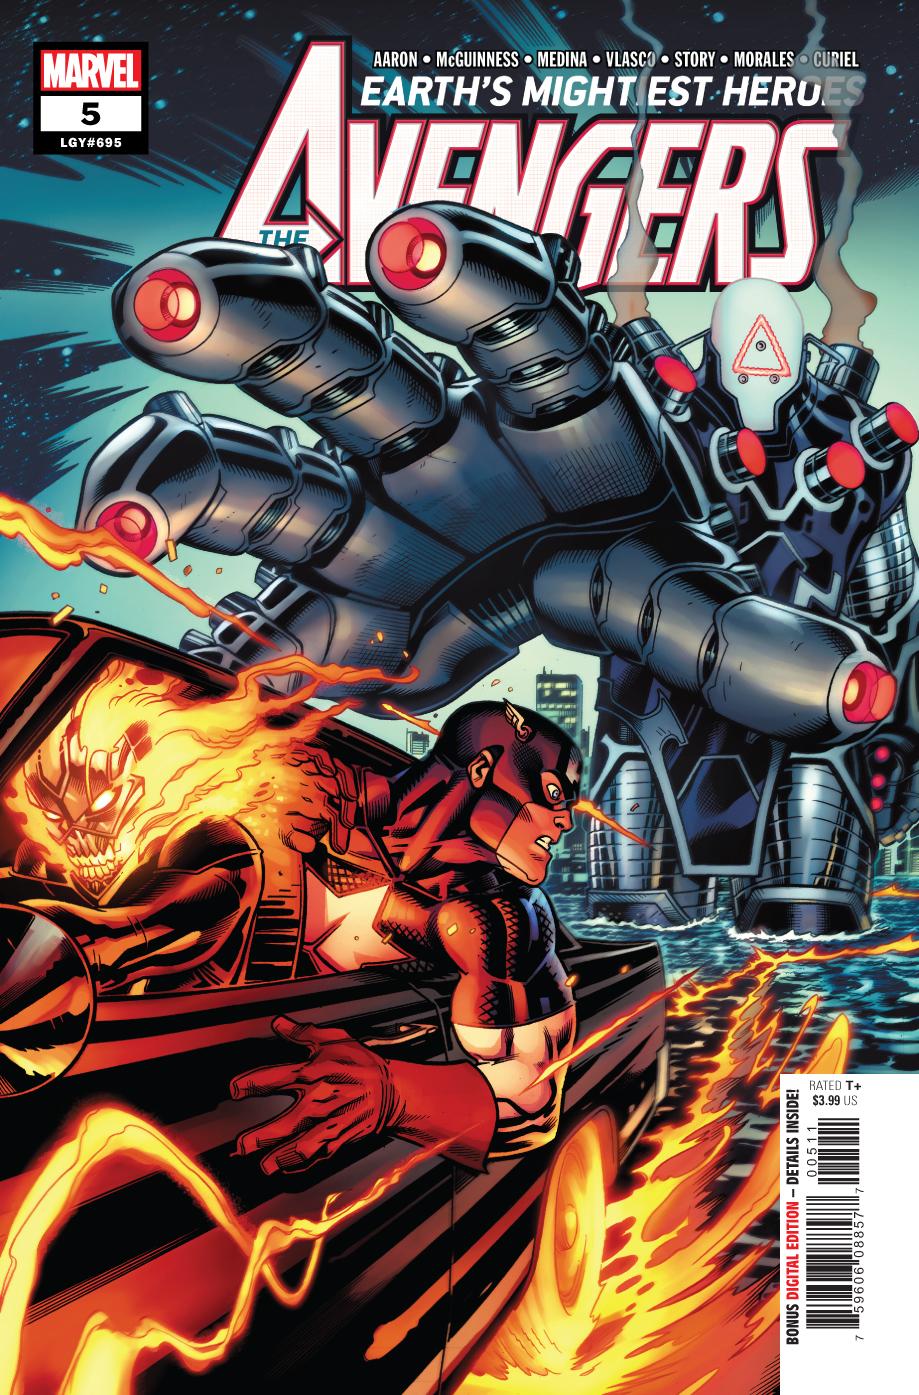 Tag 2 sur DC Earth - Forum RPG Comics A15b6521bb2c2549ad10ccb0852b56ebed864299